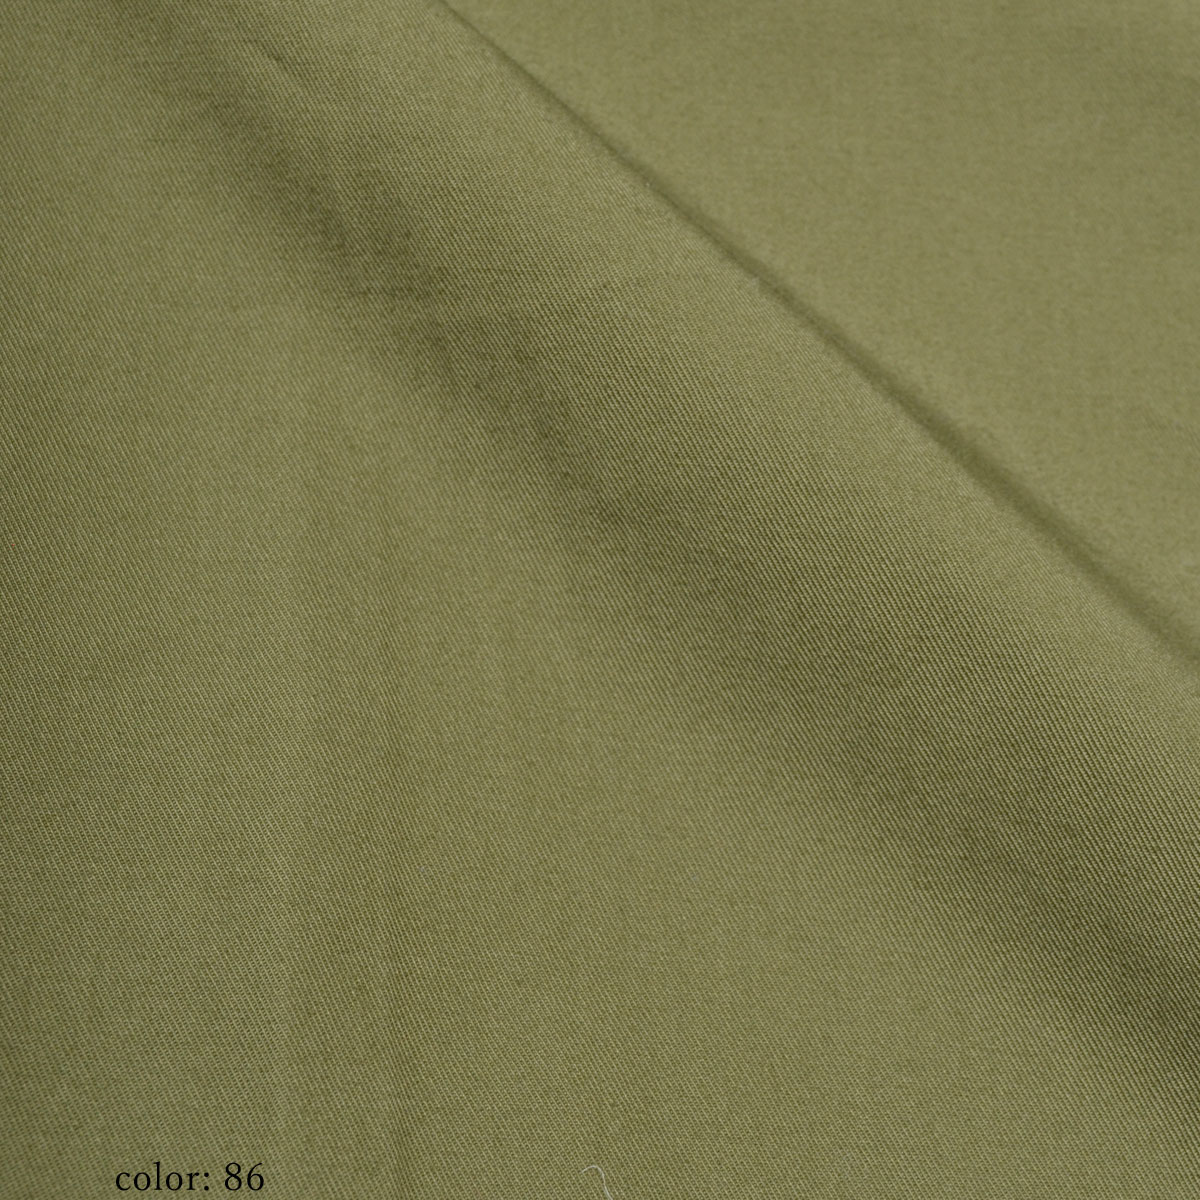 【SALE】コンパクトギャバ ミリタリーワイド CA6364